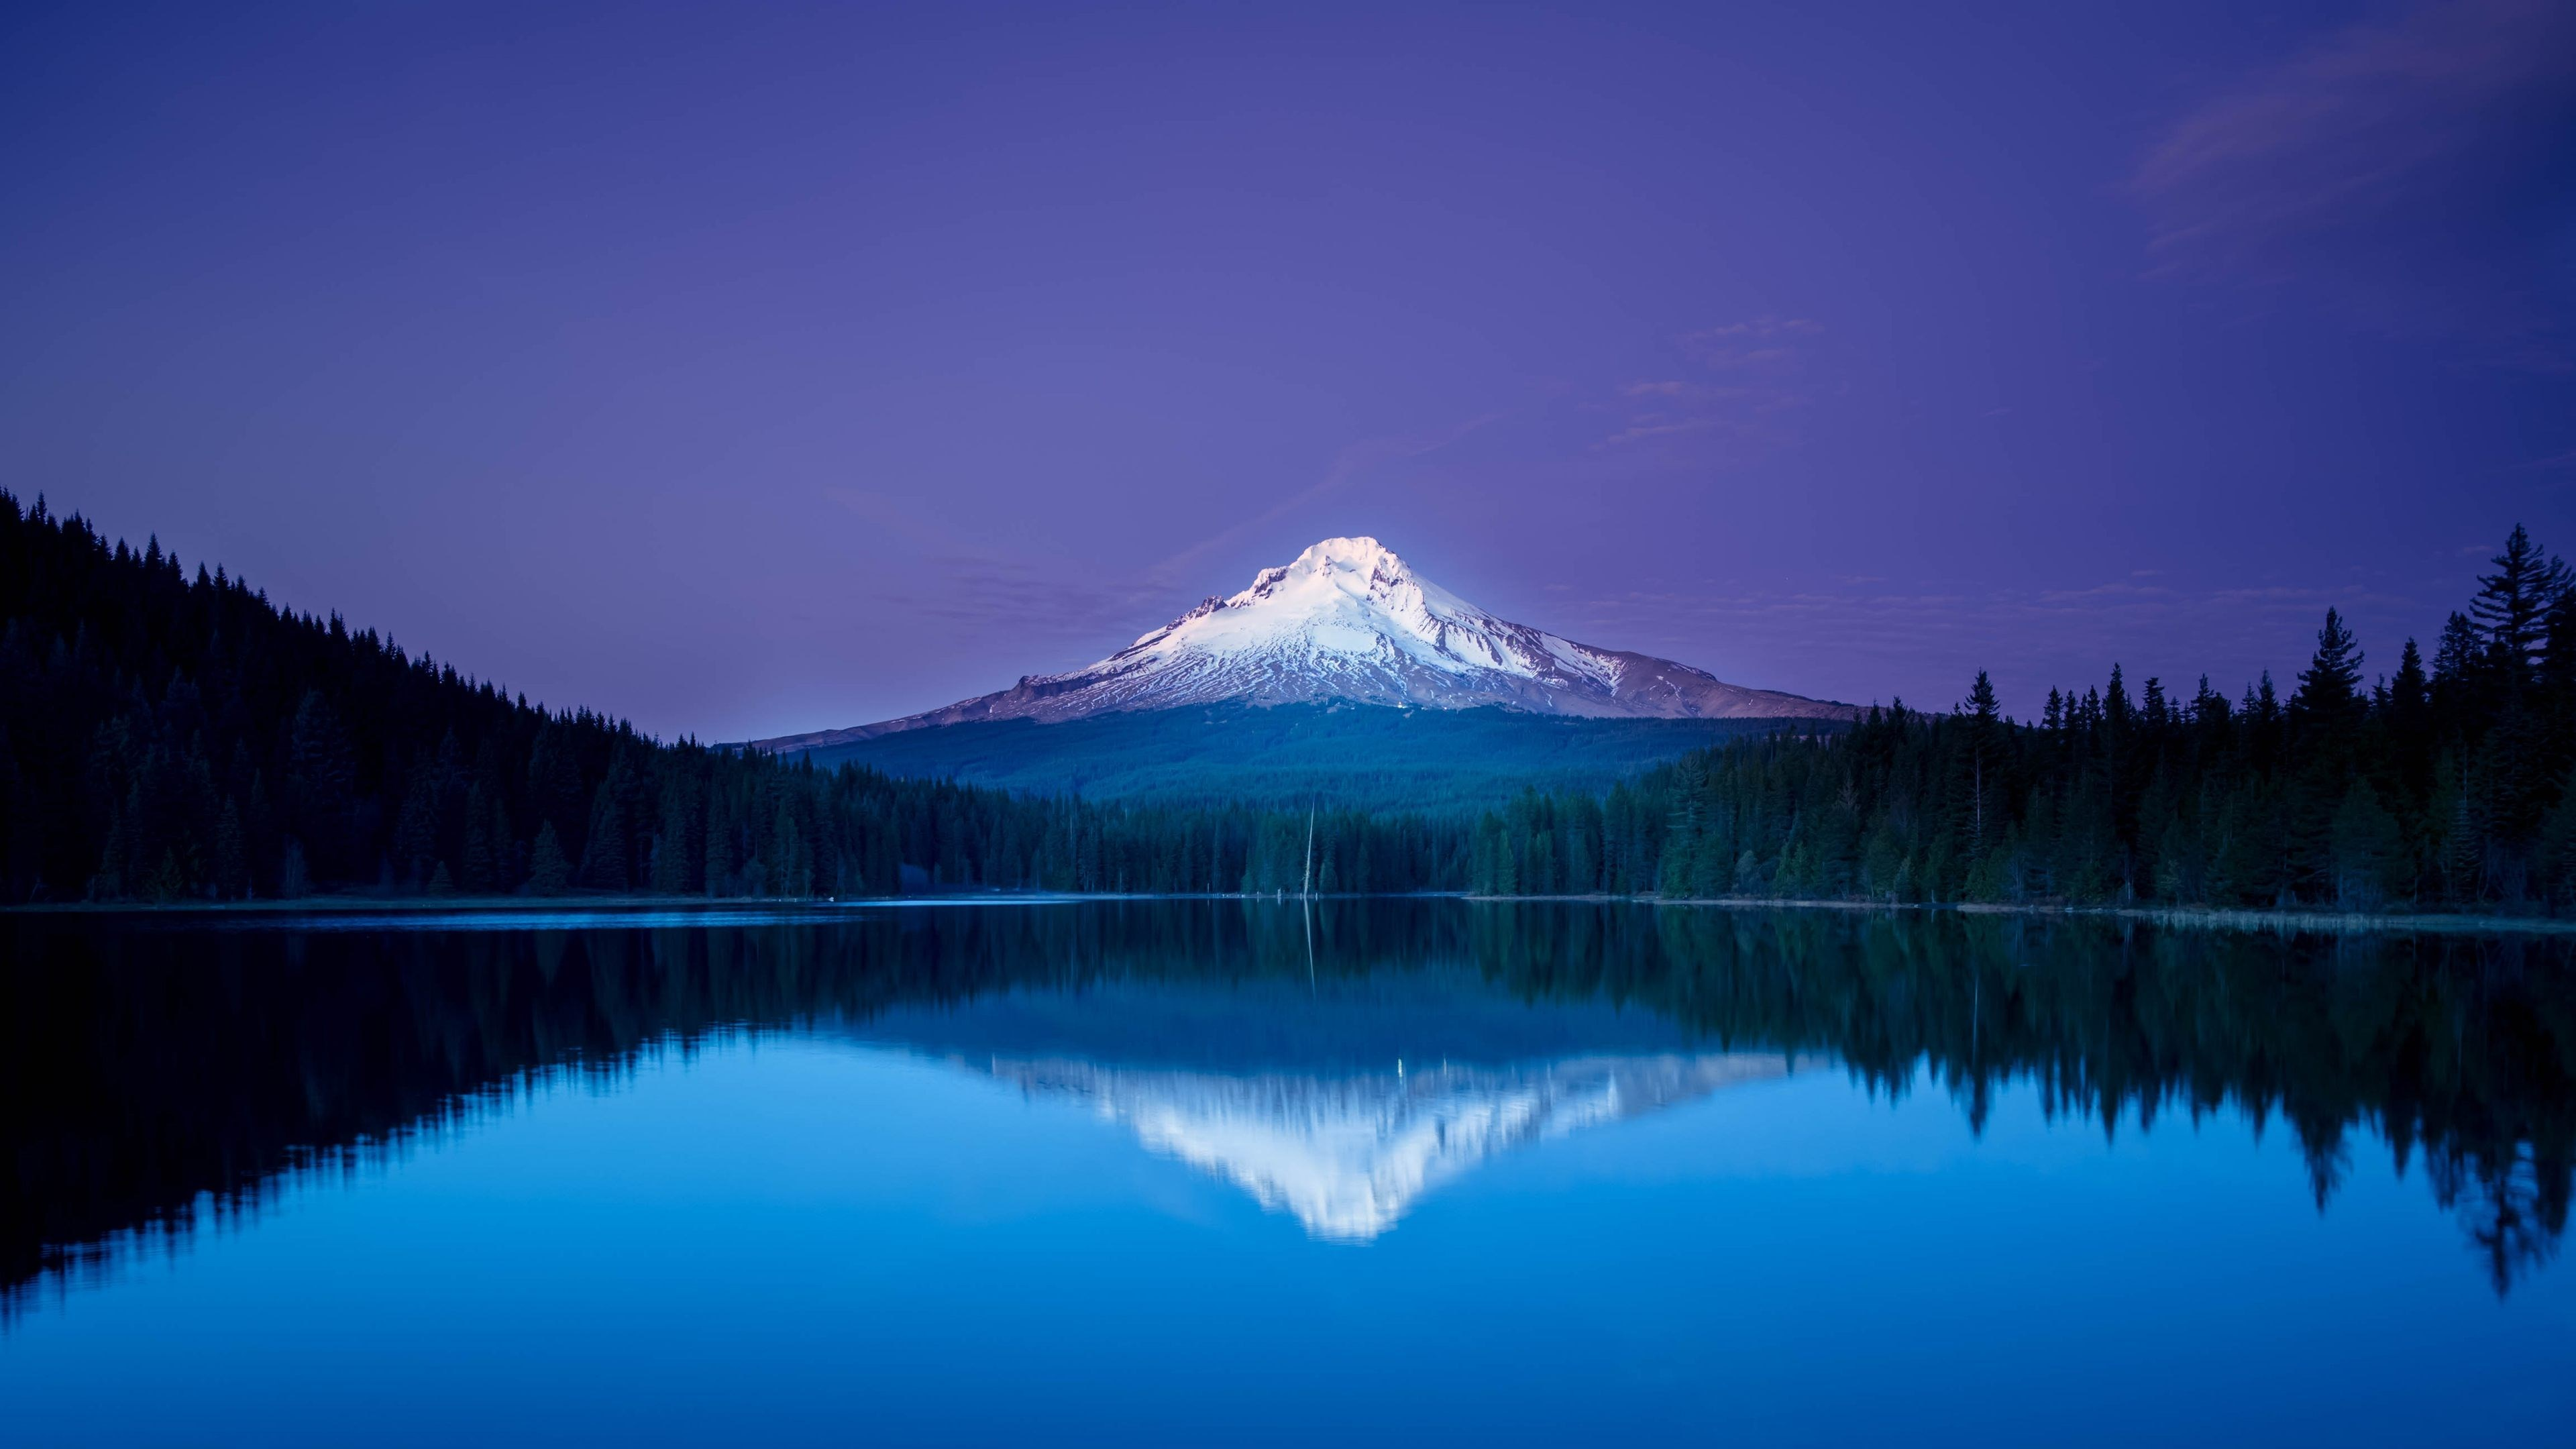 Landscape Lake Mountains 4k, HD Nature, 4k Wallpapers ...